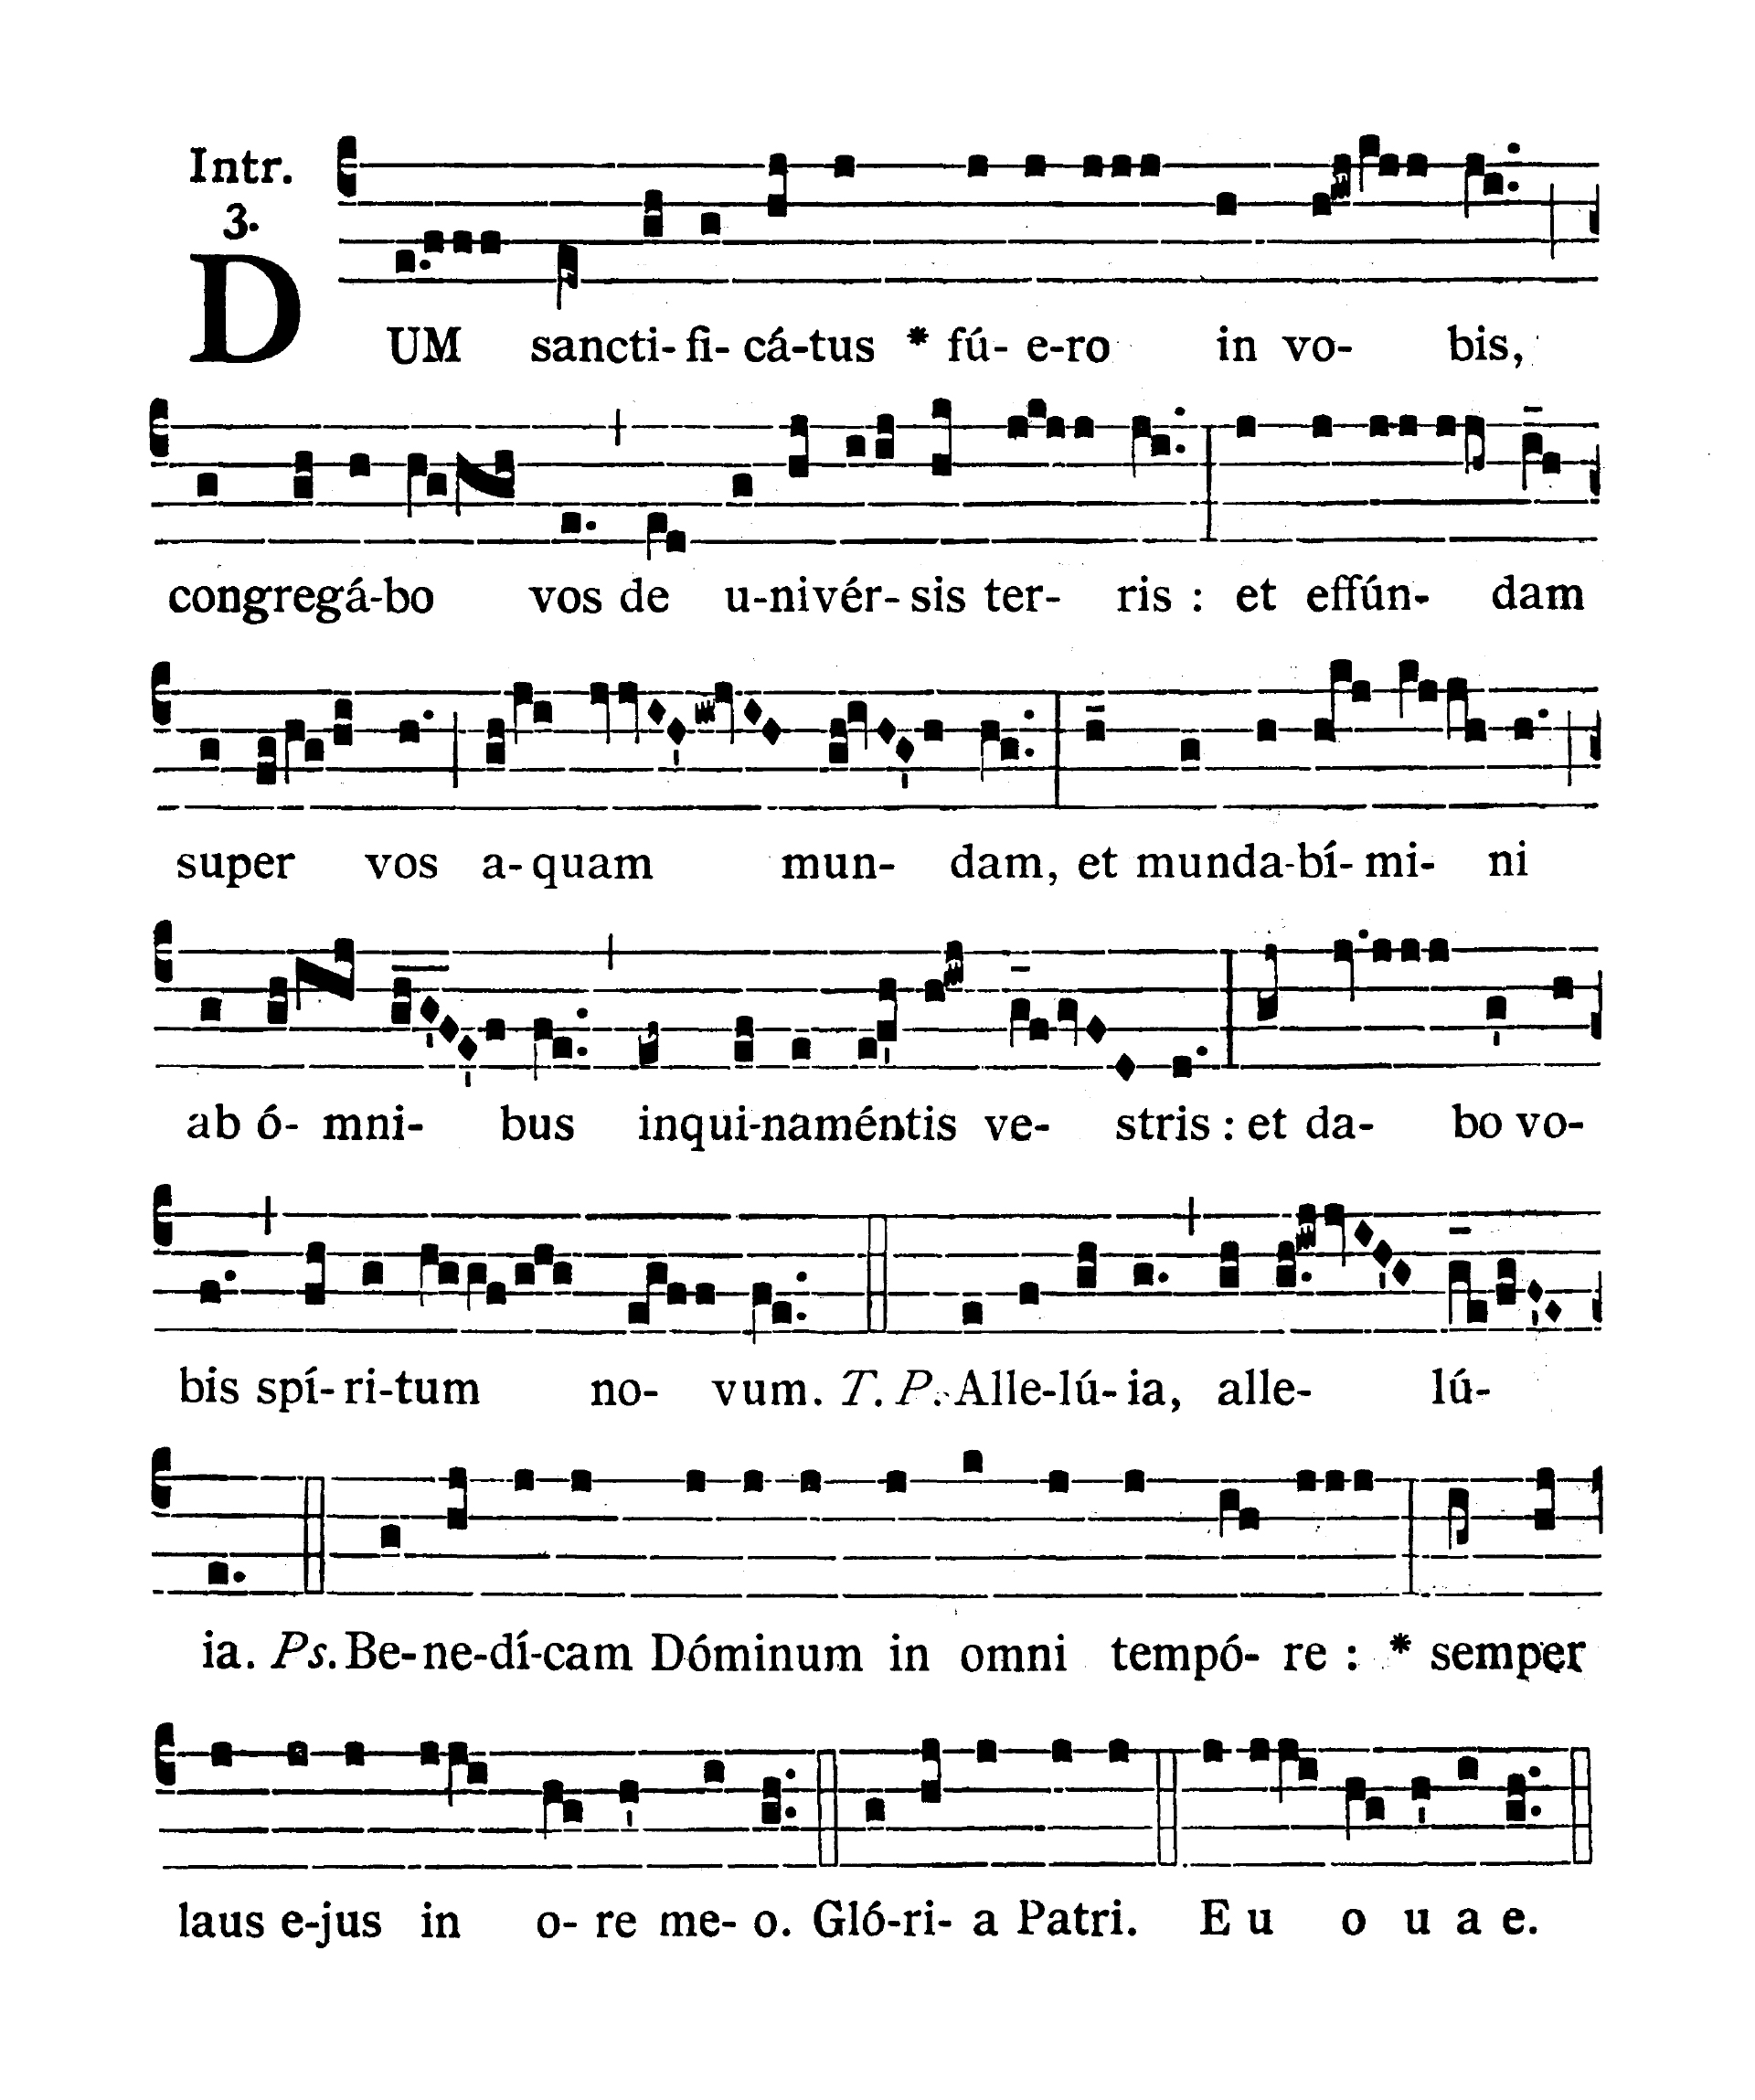 In Vigilia Pentecostes (Wigilia Zesłania Ducha Świętego) - Introitus (Dum sanctificdtus fuero)